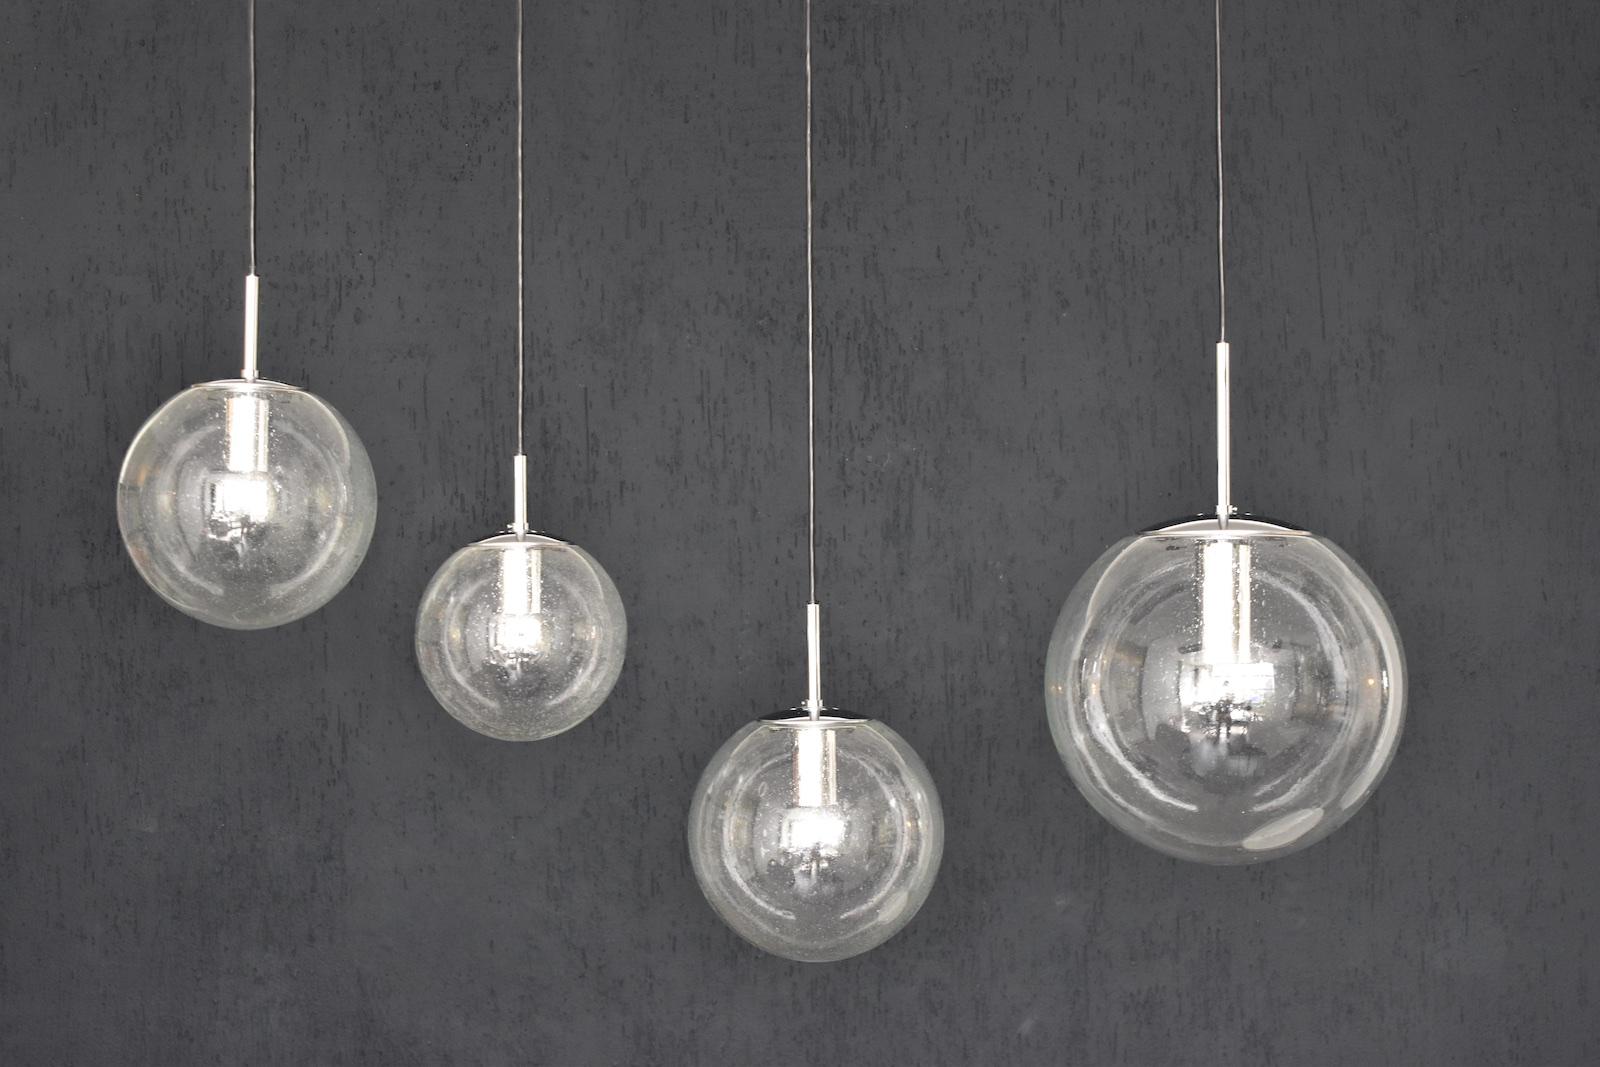 4x glash tte limburg 4101 pendelleuchten bubble globe. Black Bedroom Furniture Sets. Home Design Ideas